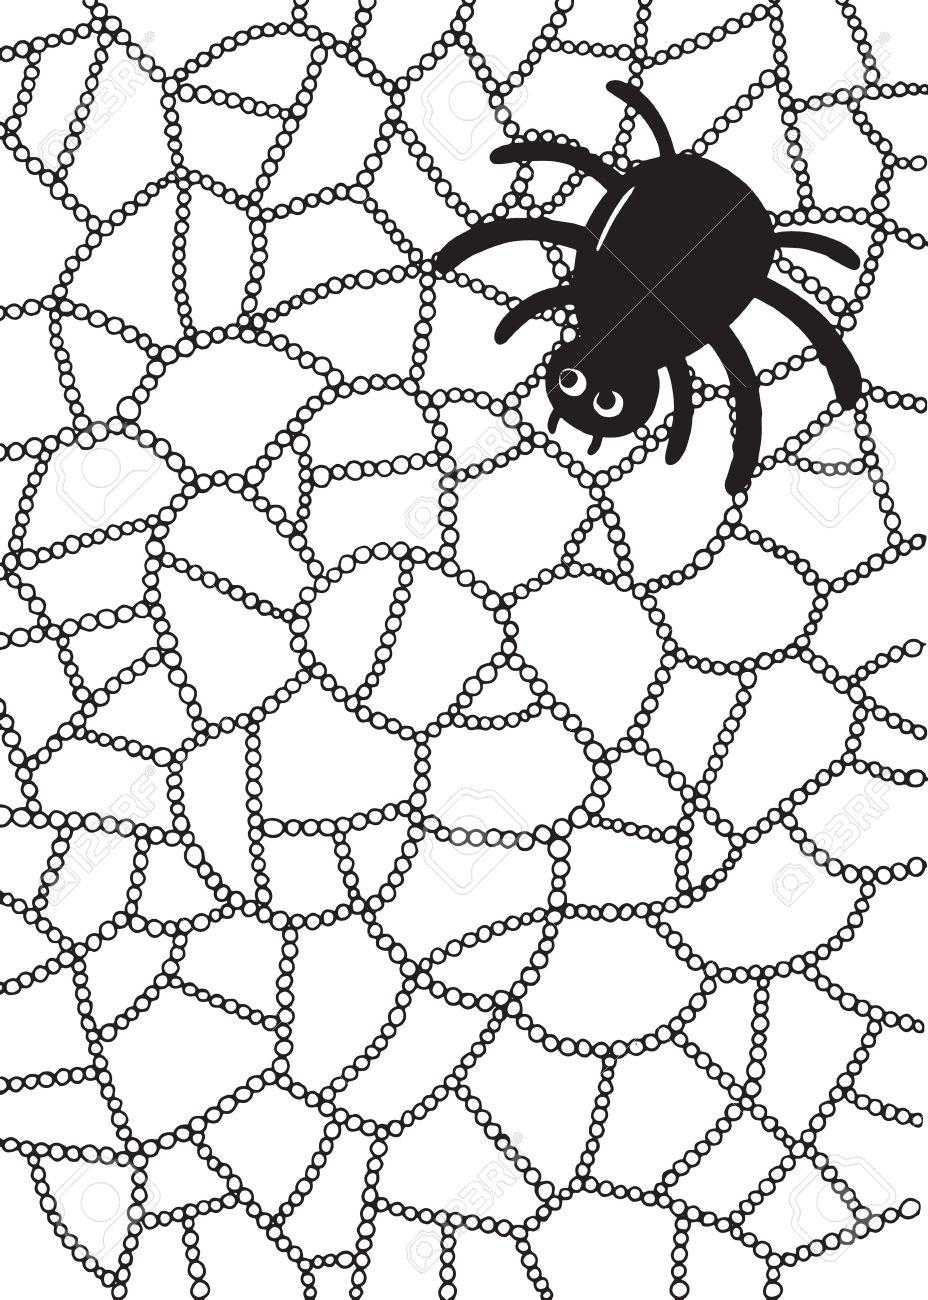 Dibujo Para Colorear Con Araña Y Tela En Gotas De Agua O Gotas De Lluvia